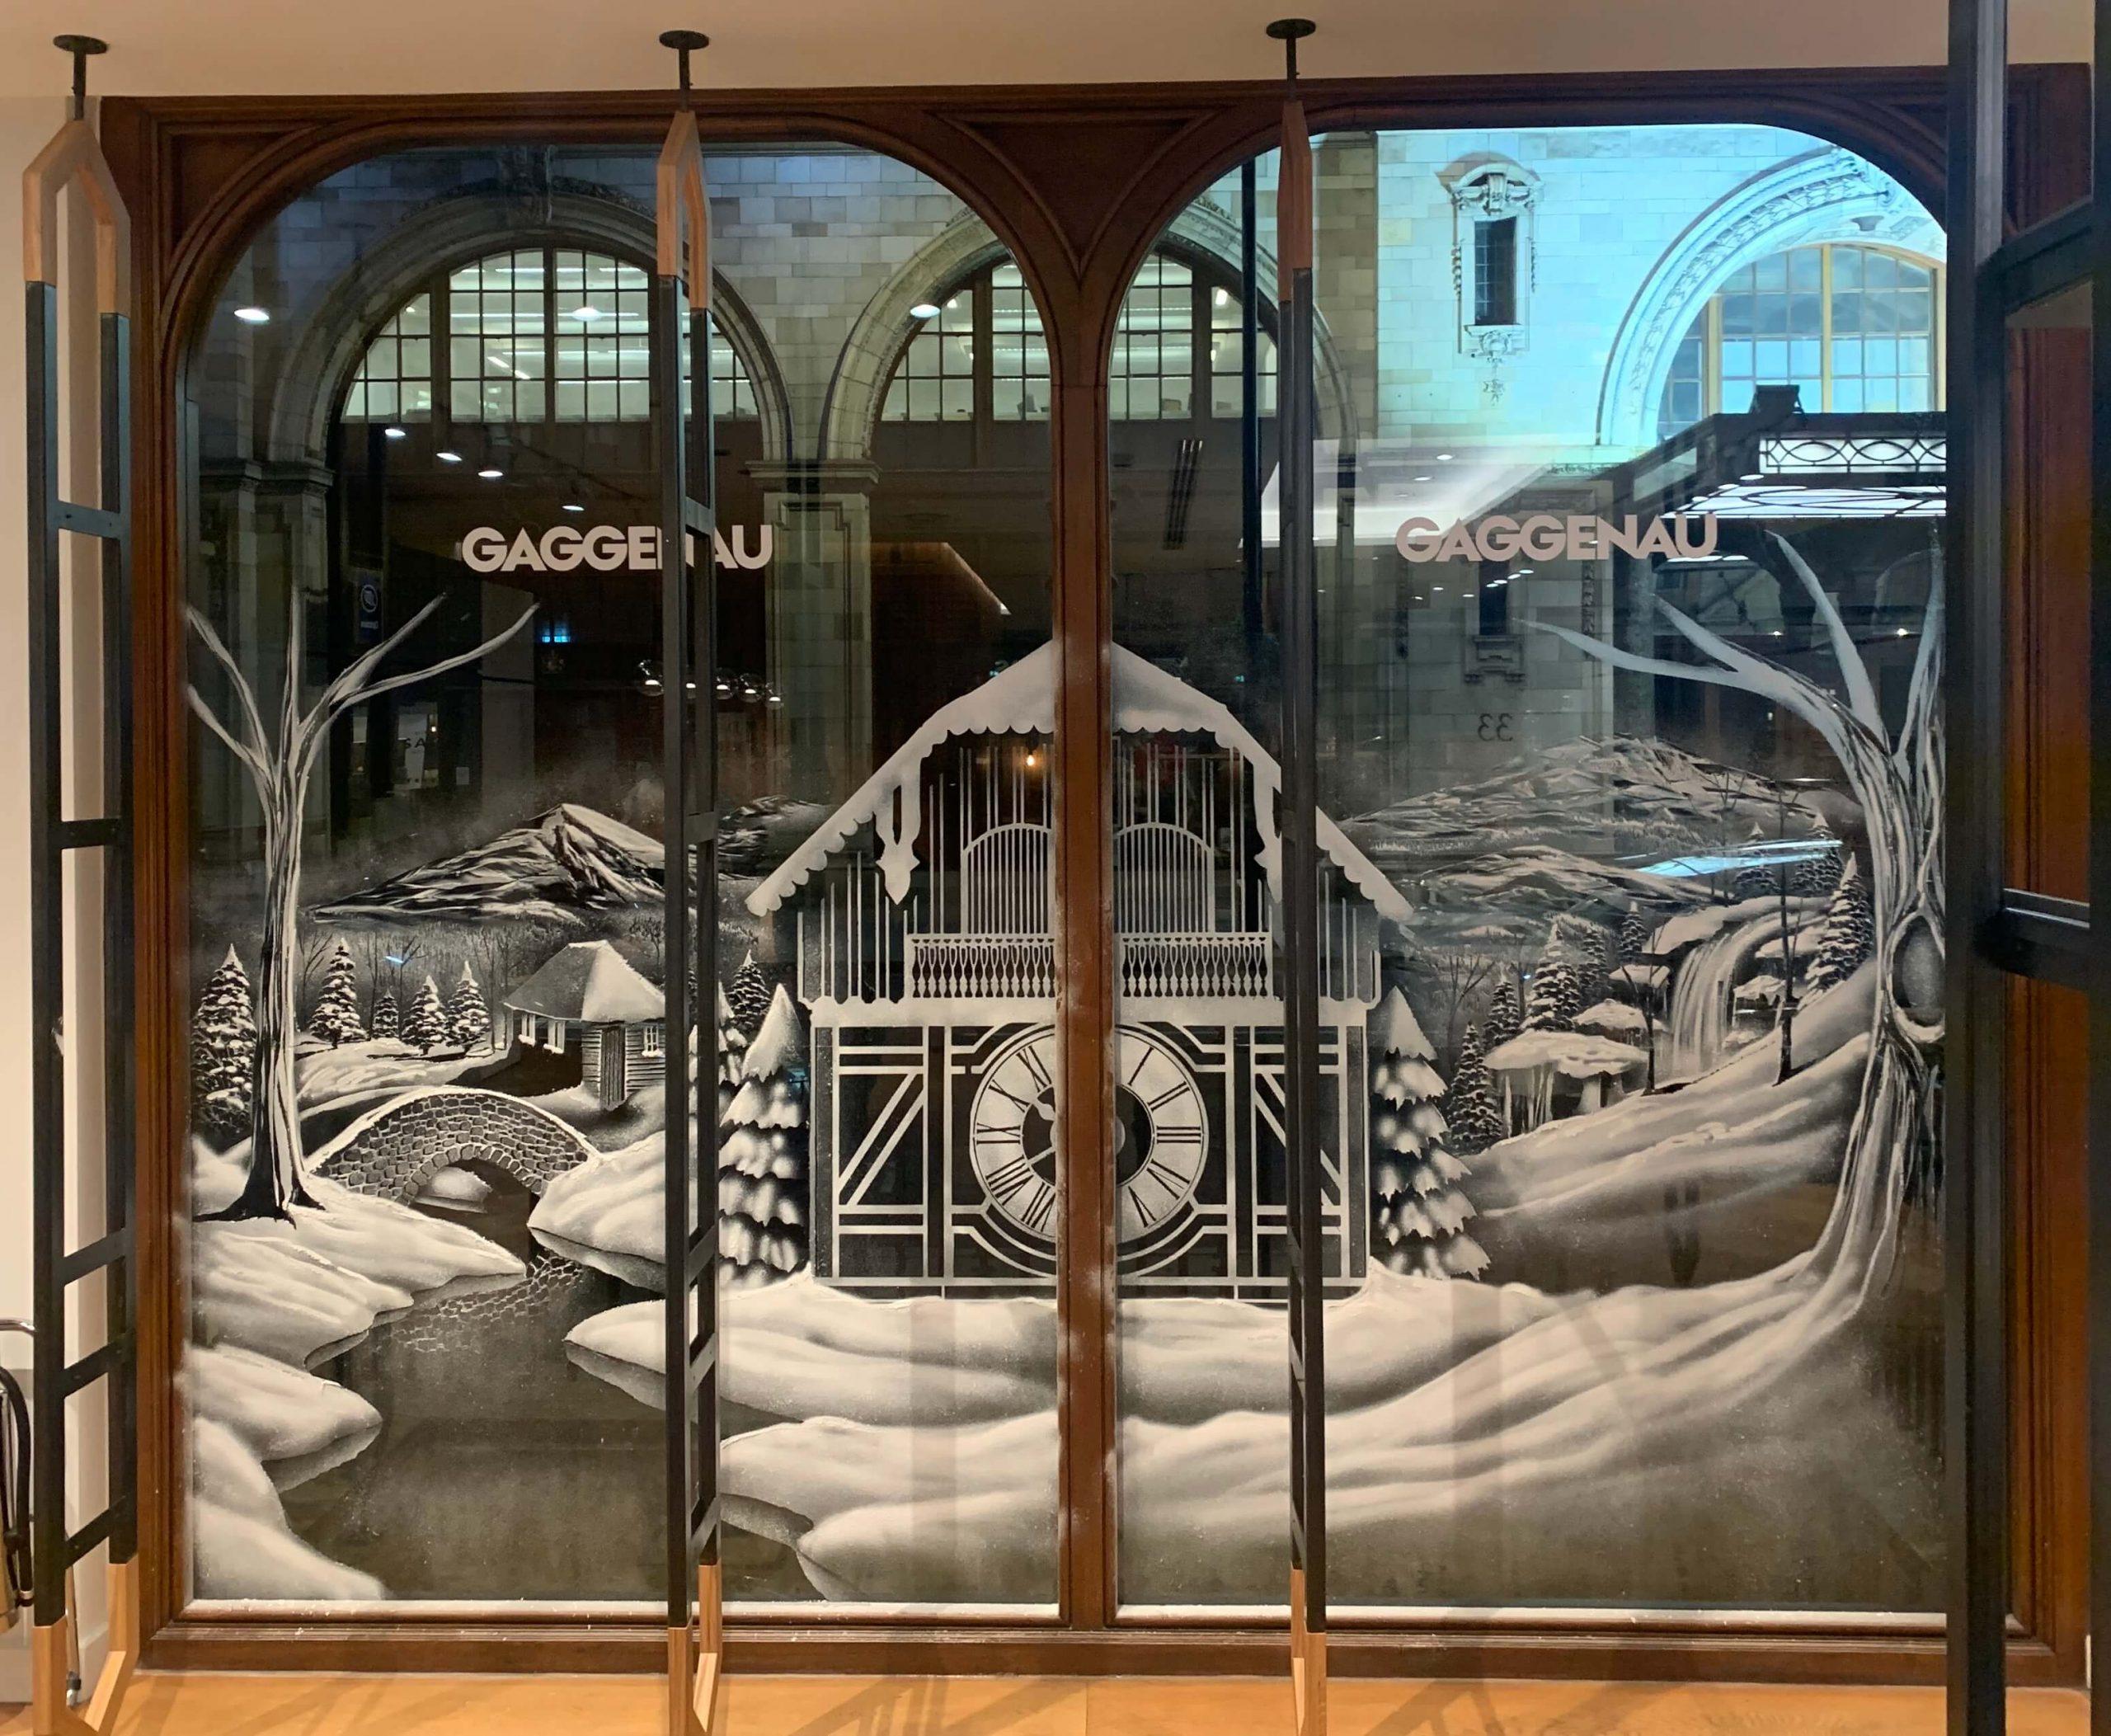 Snow Windows Window - Gaggenau Showroom Snow Scene with clockhouse